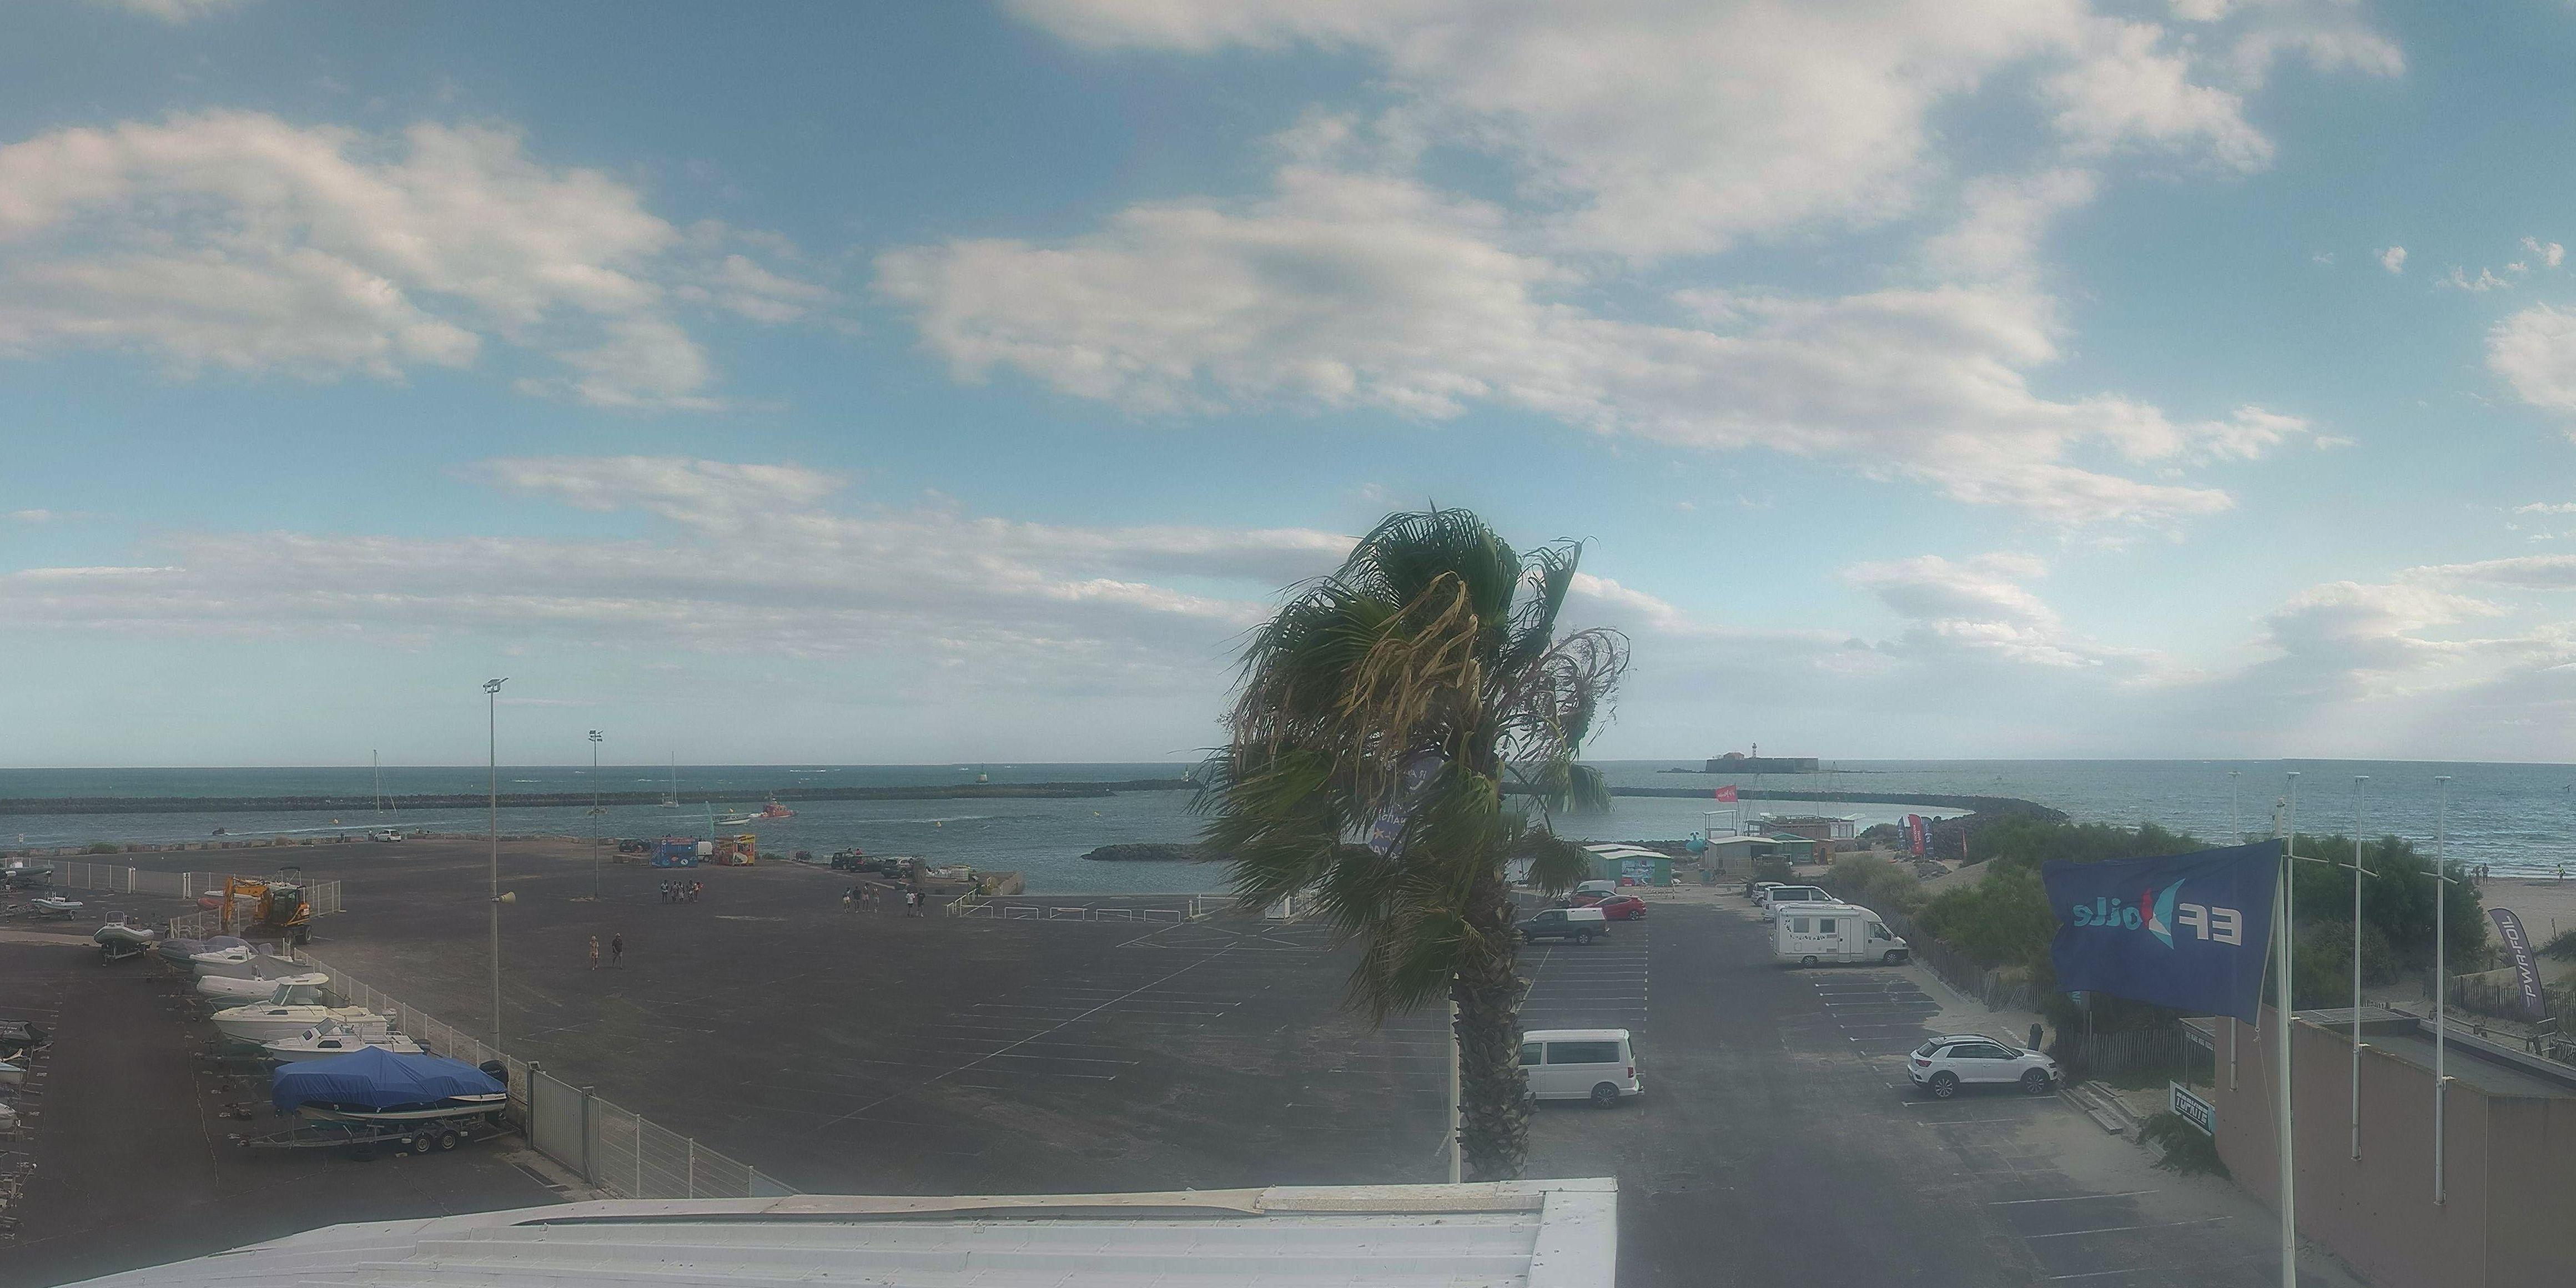 Webcam cap d 39 agde panoramique hd for Cap d agde jardin d eden